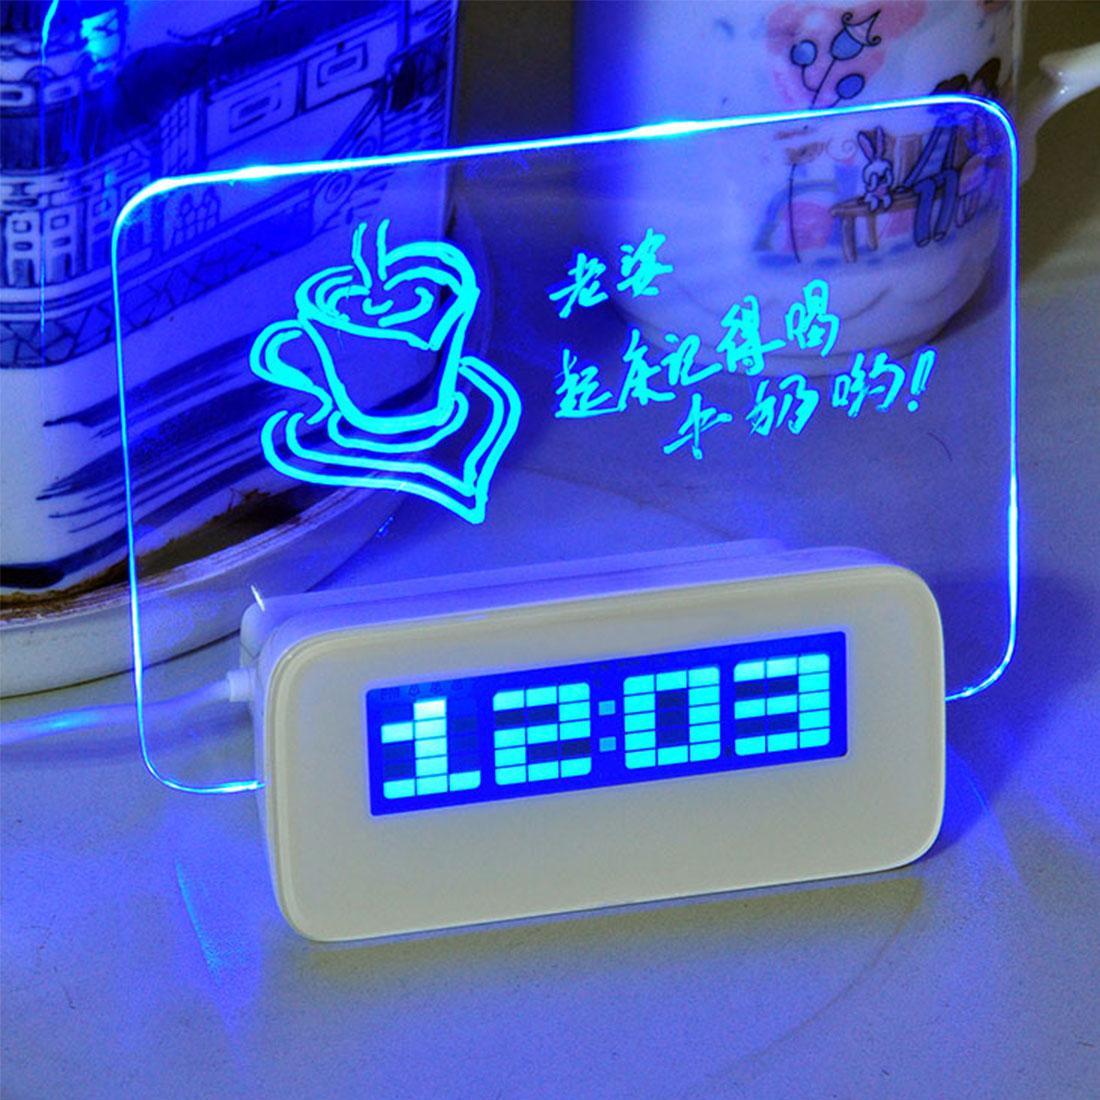 Practical LED Digital Clock led Luminous Message Board Alarm Clock With Calendar Desktop Clocks for Home Decor